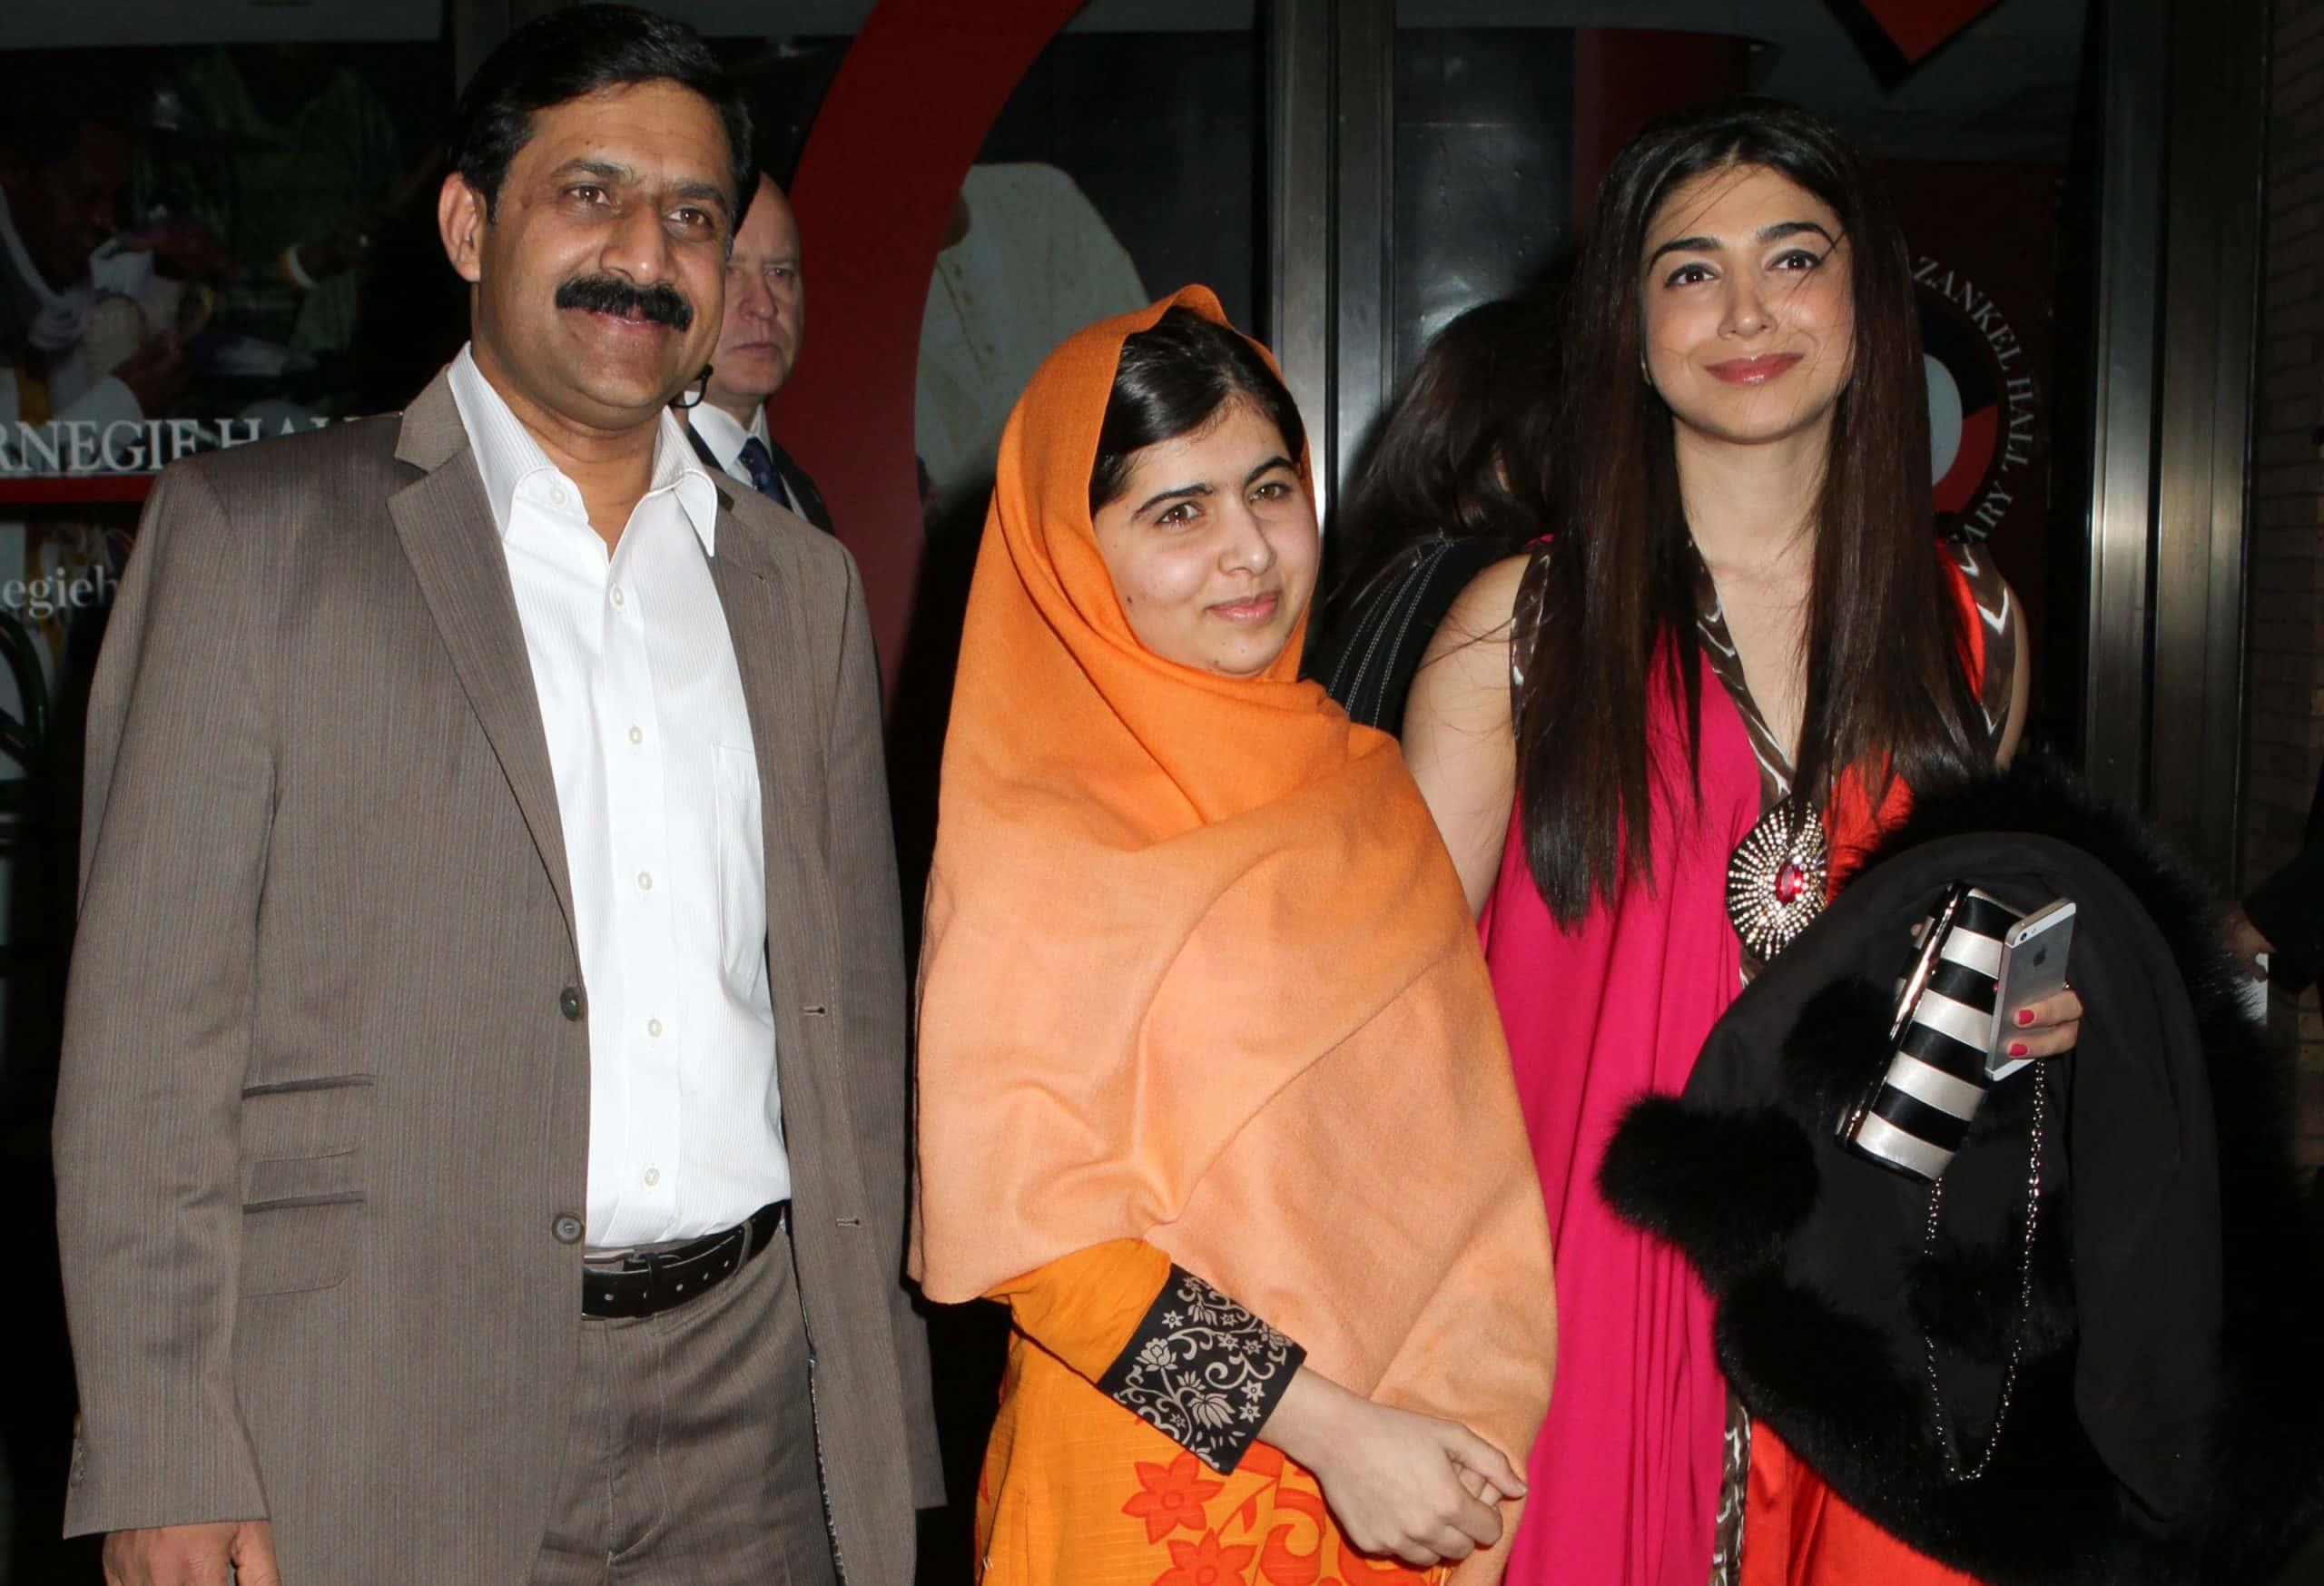 Malala Yousafzai Facts